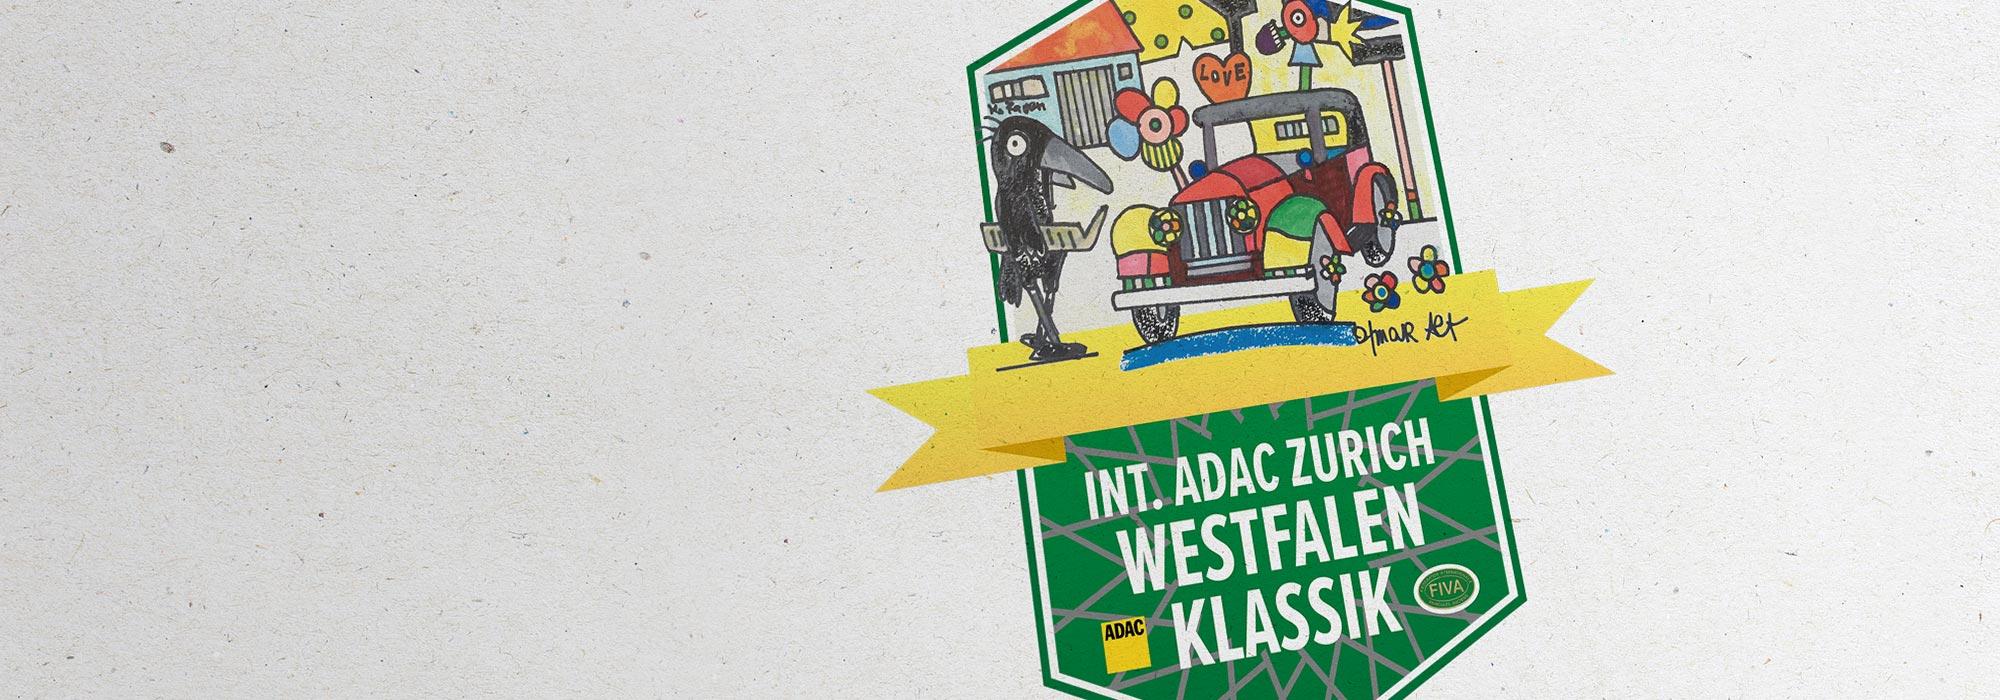 ADAC Zurich Westfalen Klassik Logo